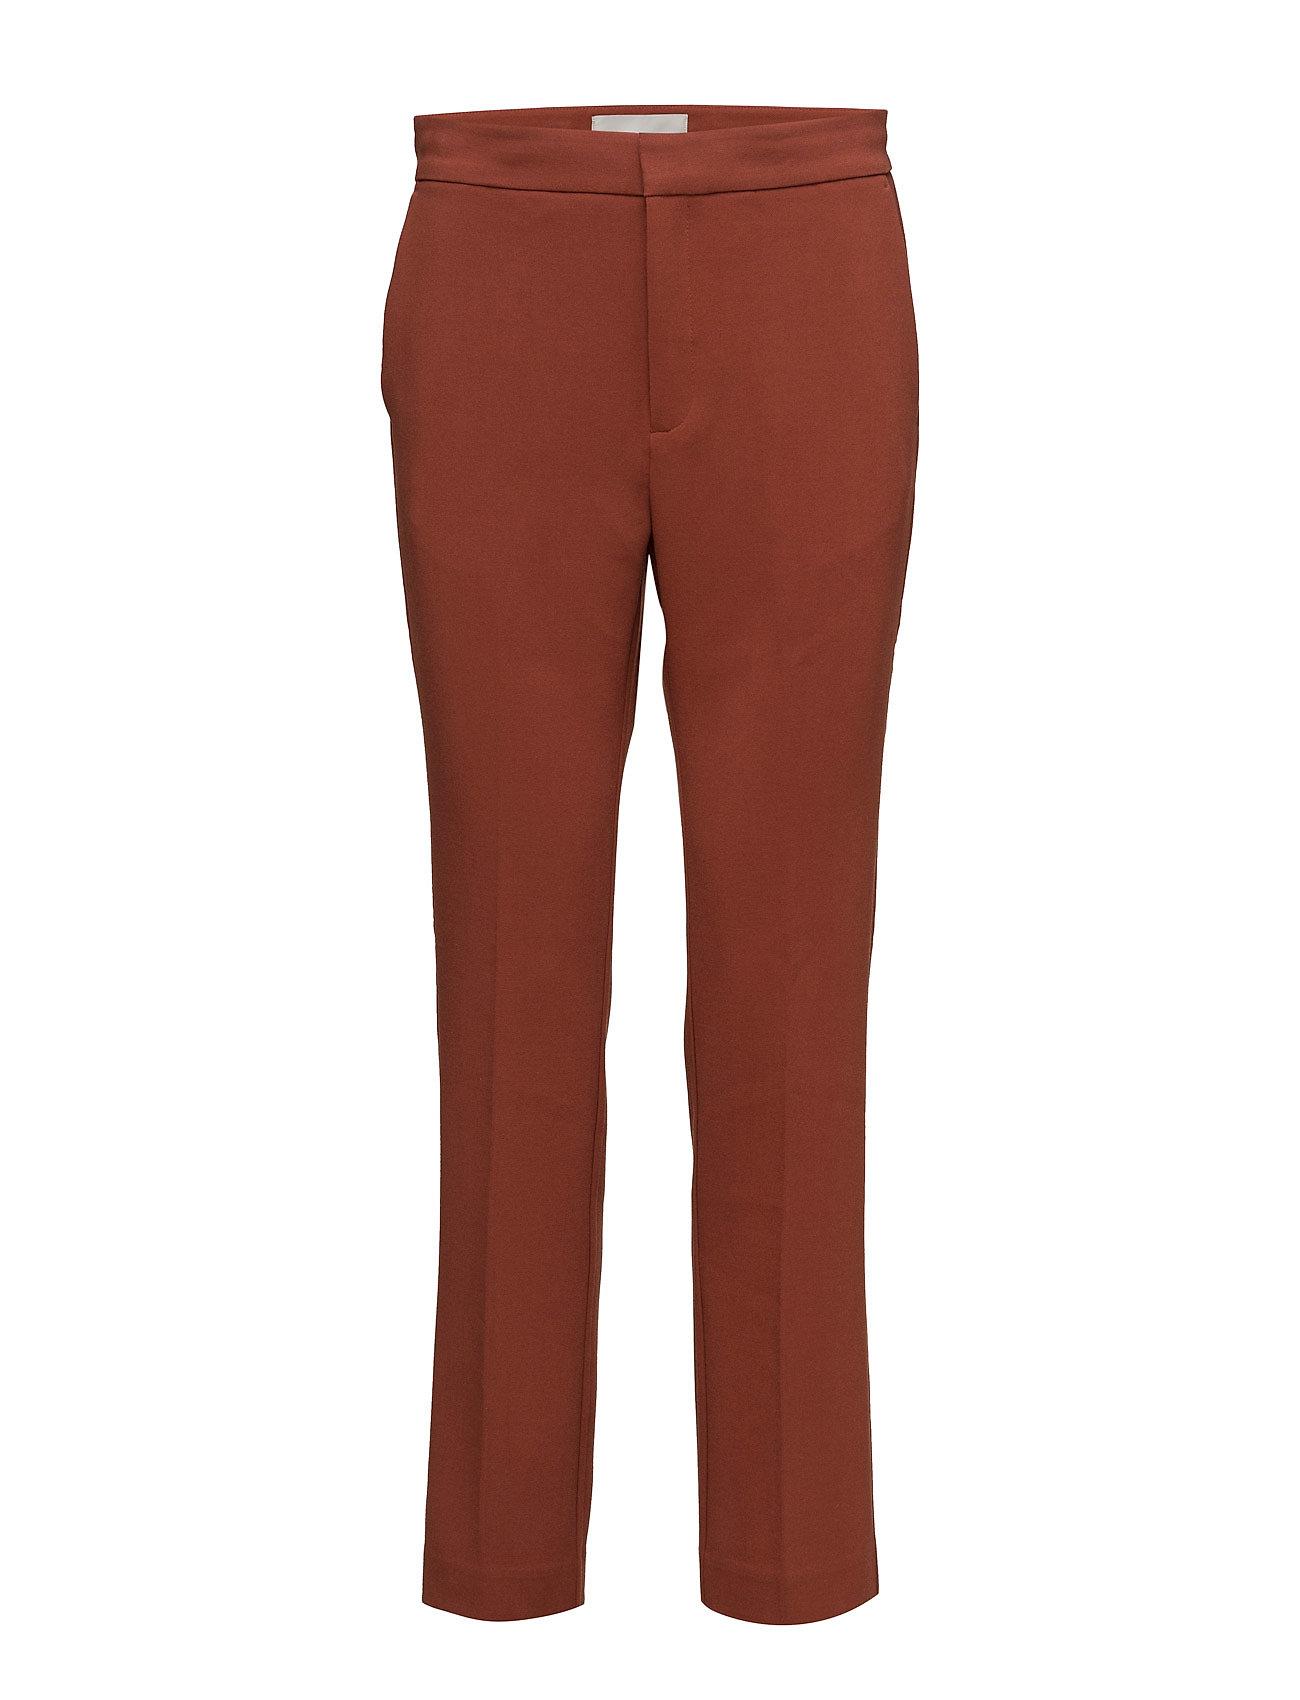 Zoya Pant Hw InWear Bukser til Kvinder i